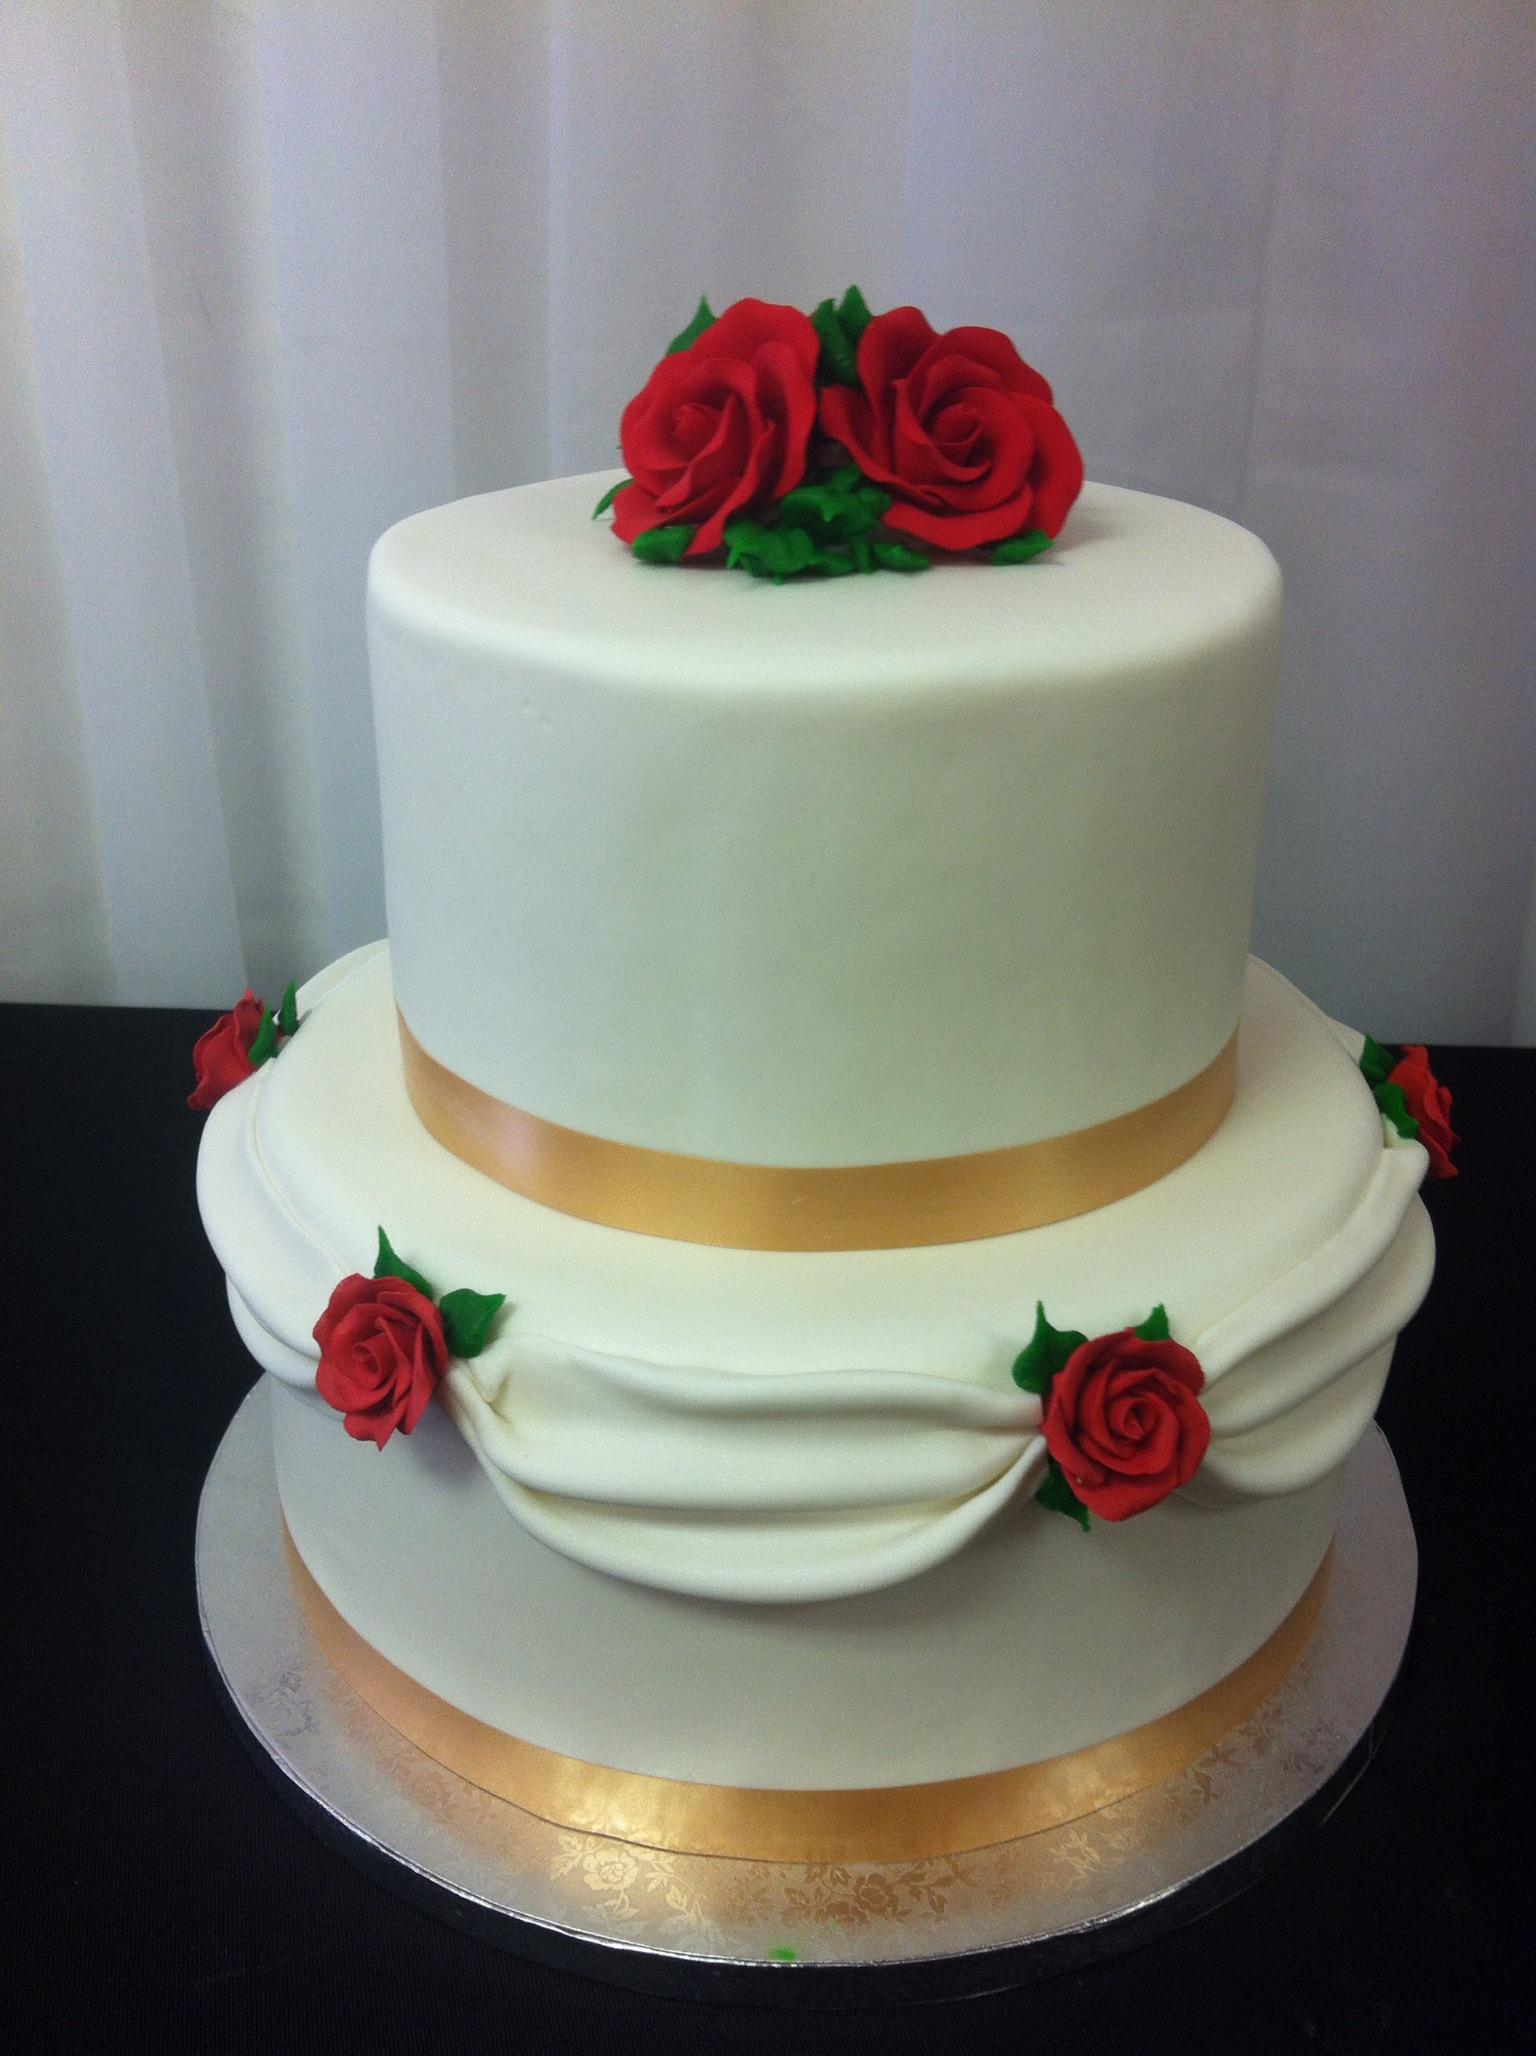 Rose 2-tier cake